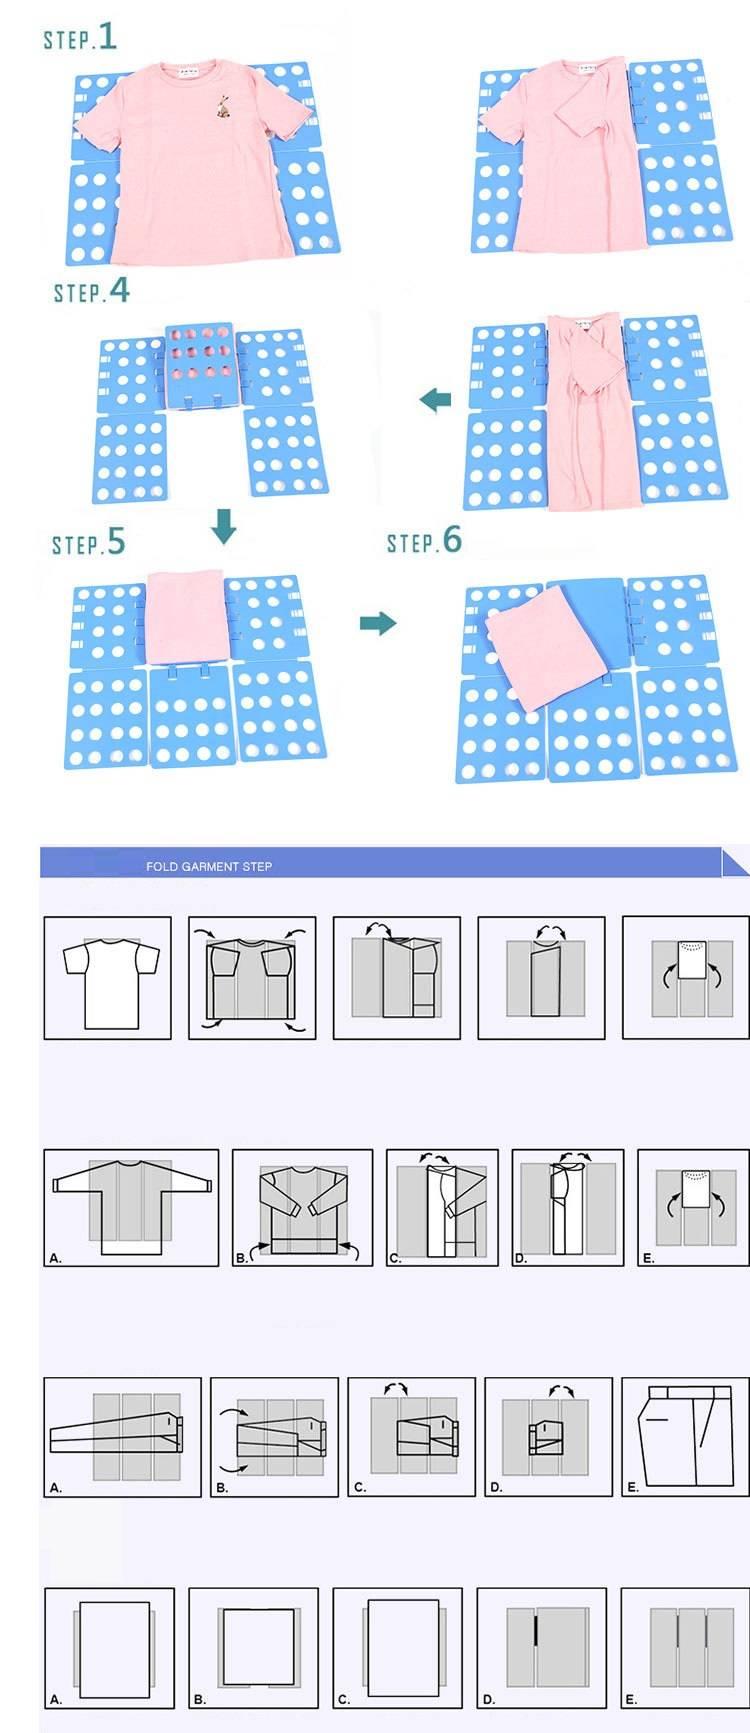 HTB1BzsmyUR1BeNjy0Fmq6z0wVXac DIY Clothes Folder  - T Shirts Jumpers Organiser